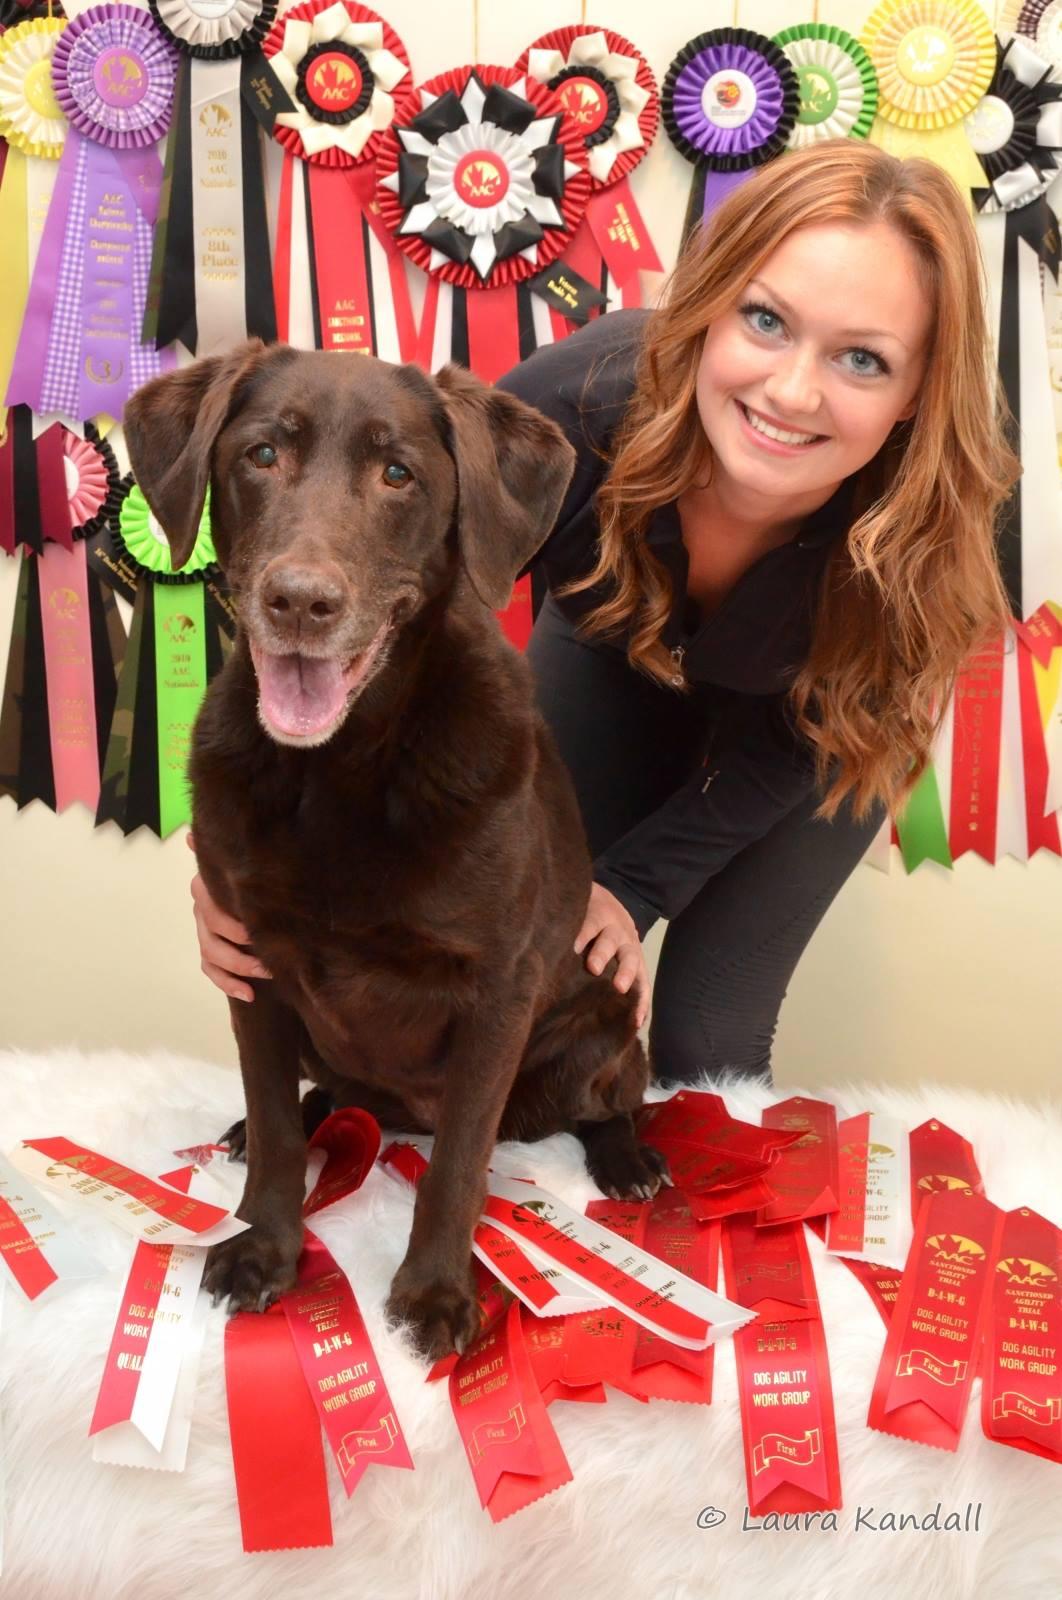 Sugar my first agility dog. 2006, 2007 BC Yukon Regional Champ and 2012 National Champion.